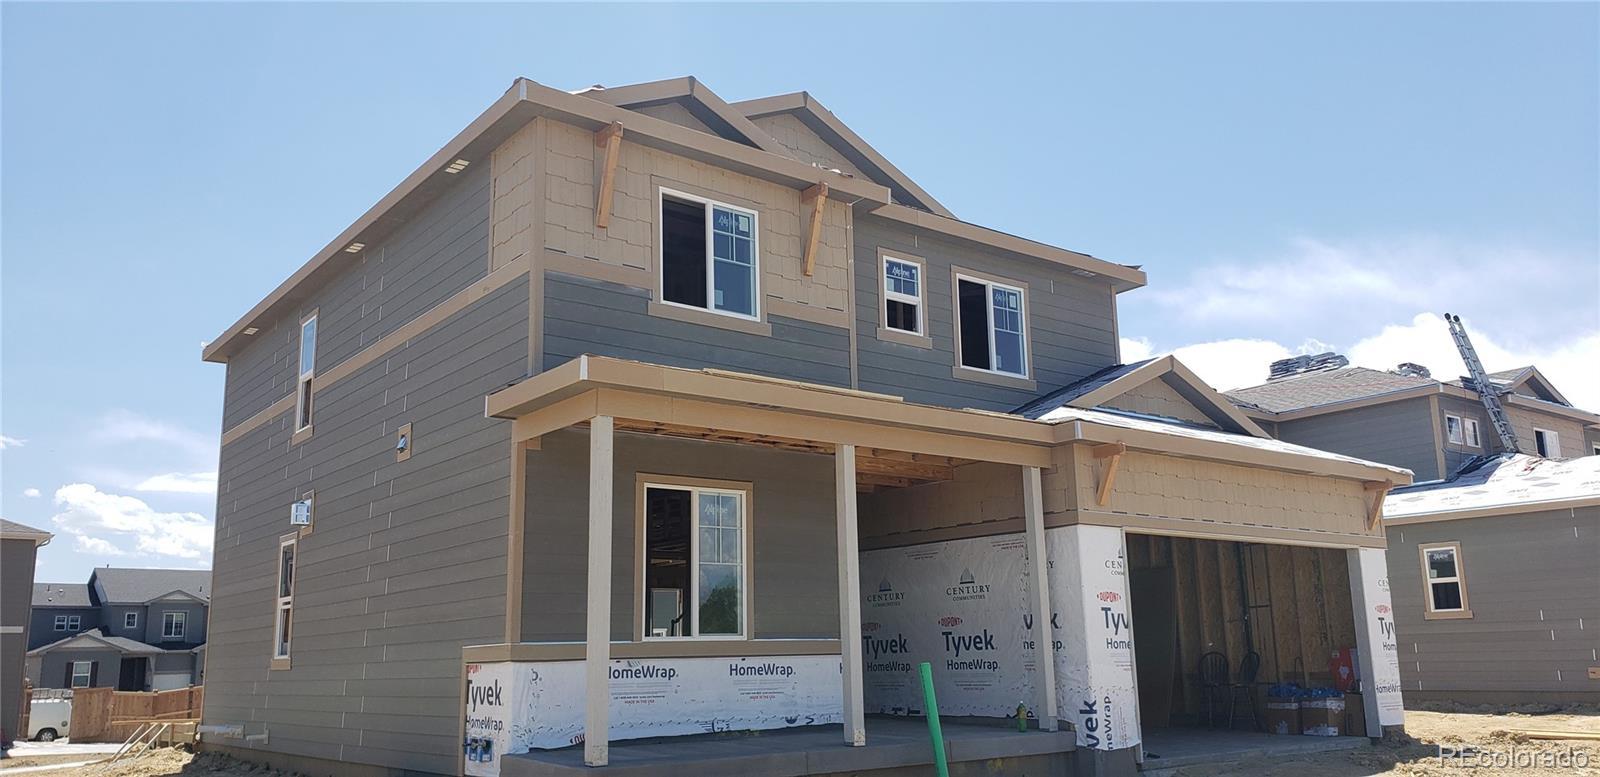 6808 E 119th Avenue Property Photo - Thornton, CO real estate listing